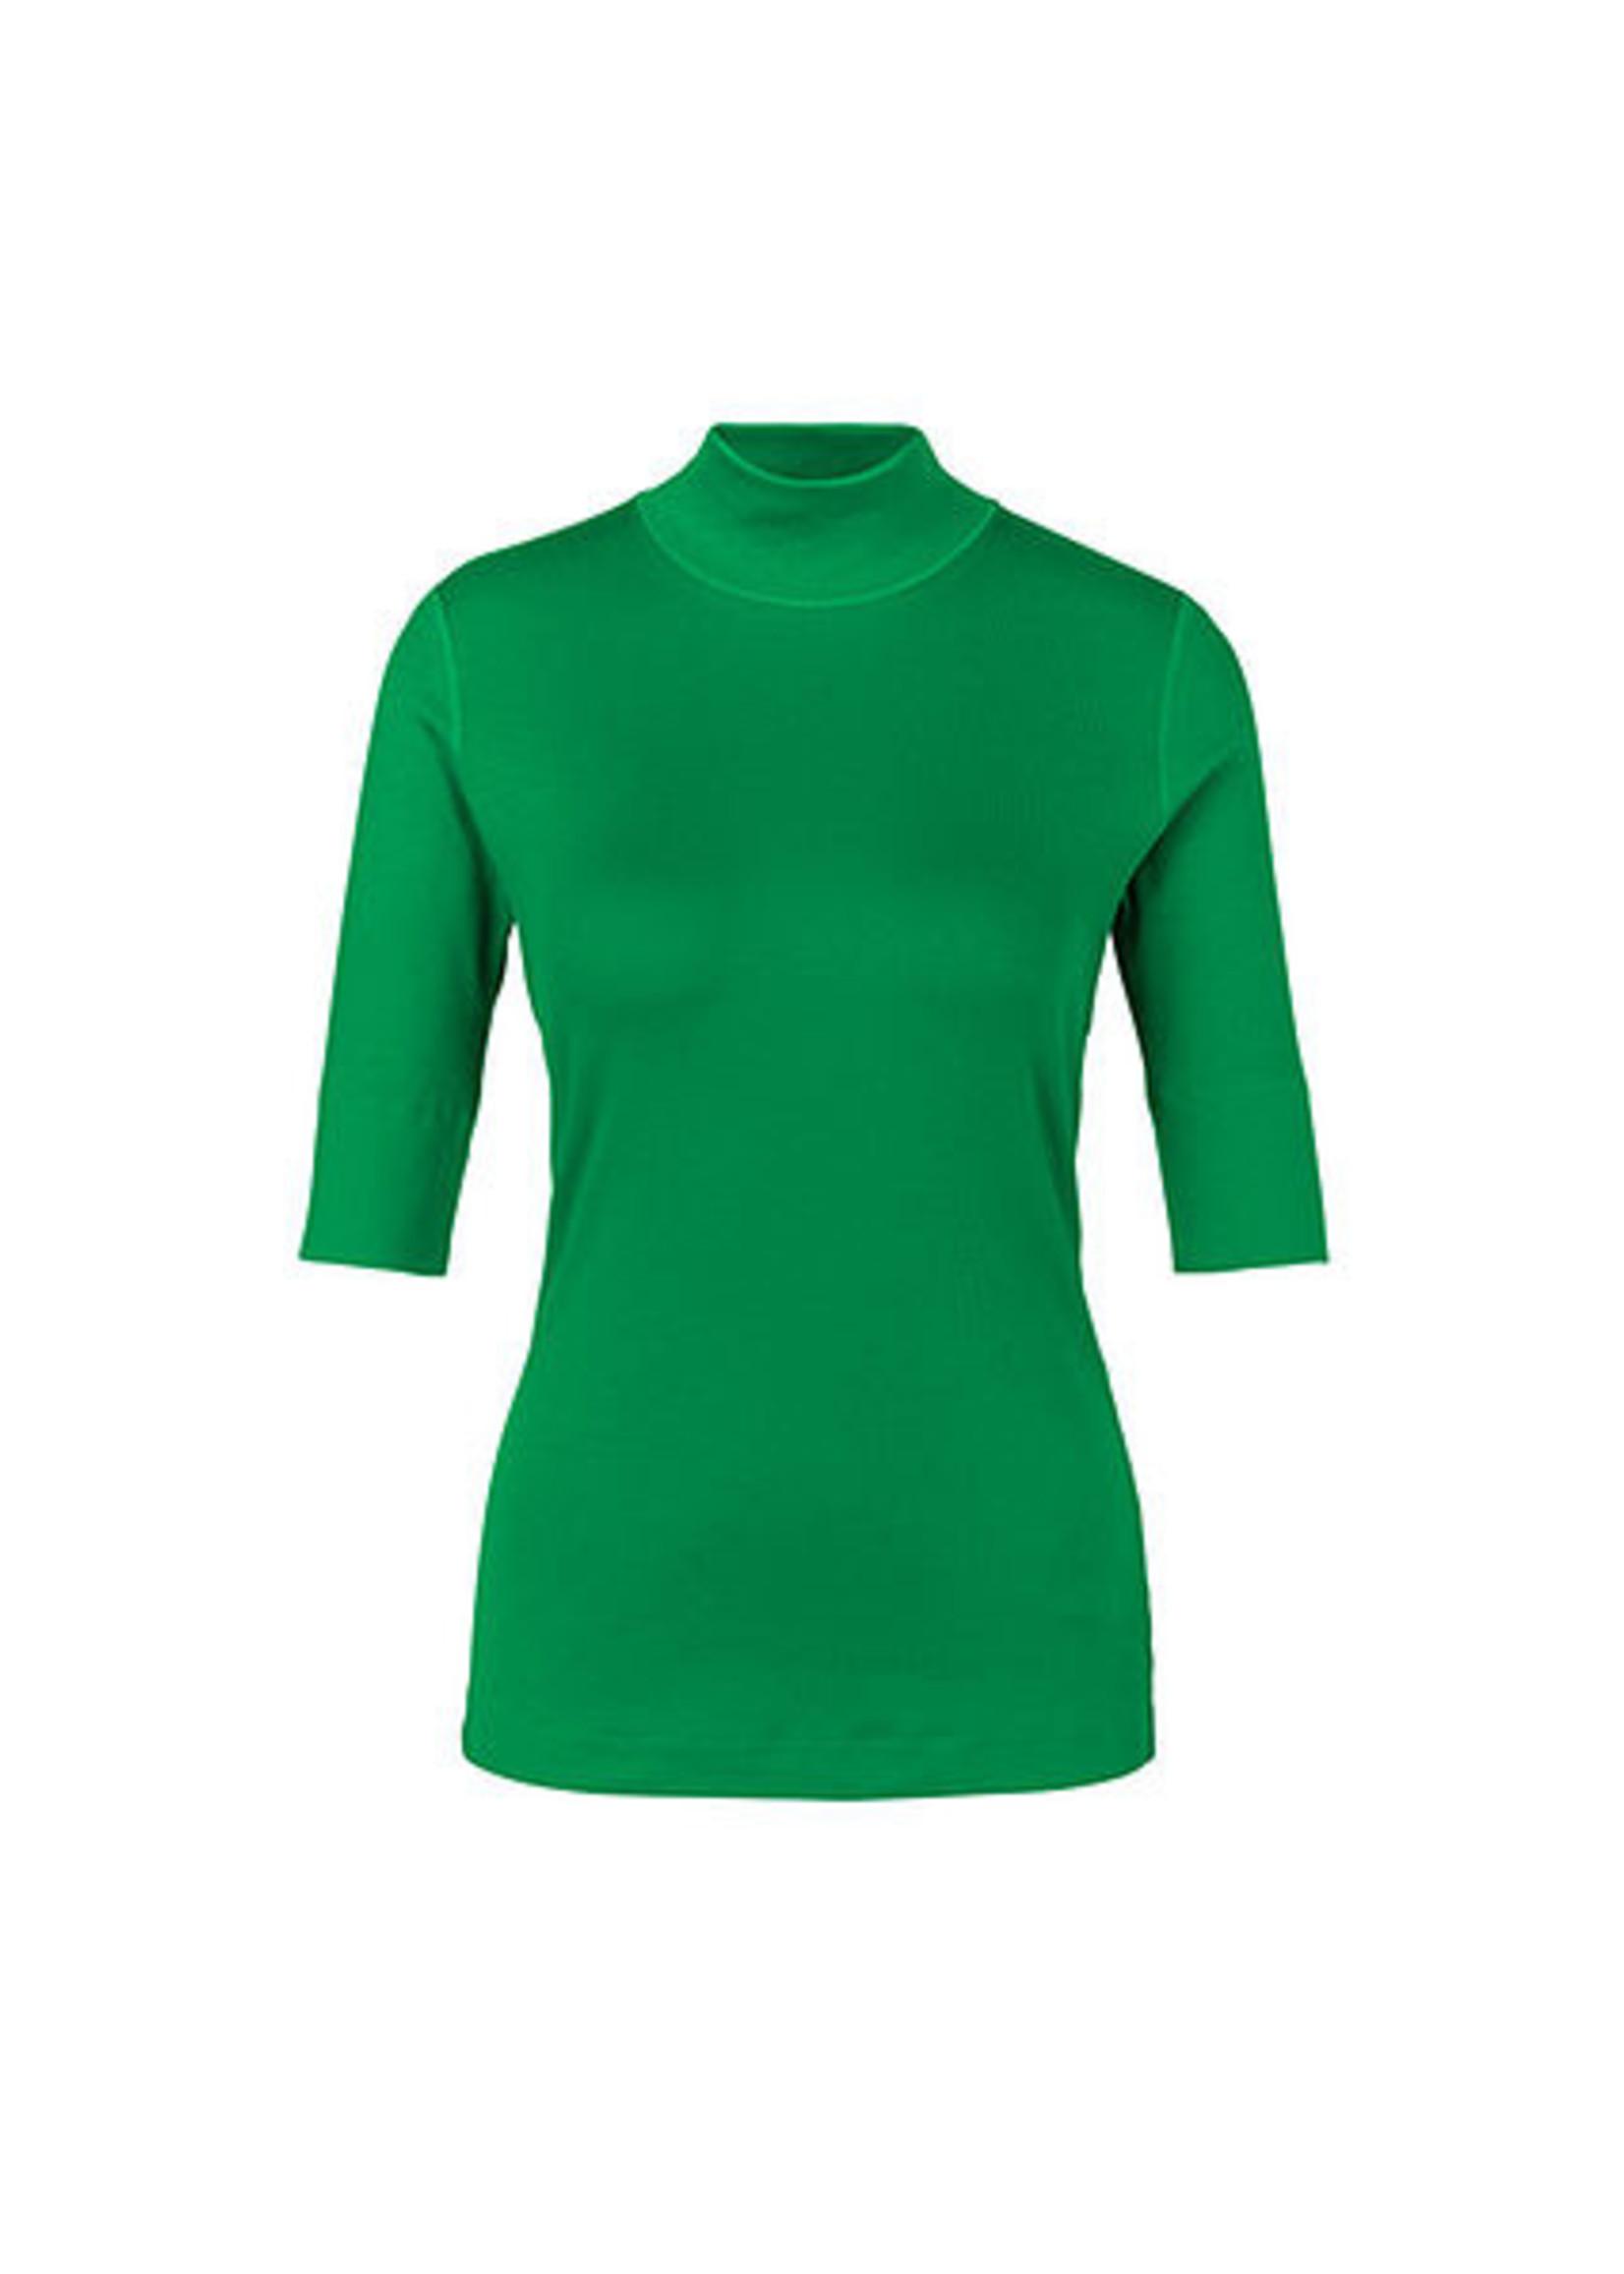 Marccain Sports T-shirt RS 48.04 J50 grass